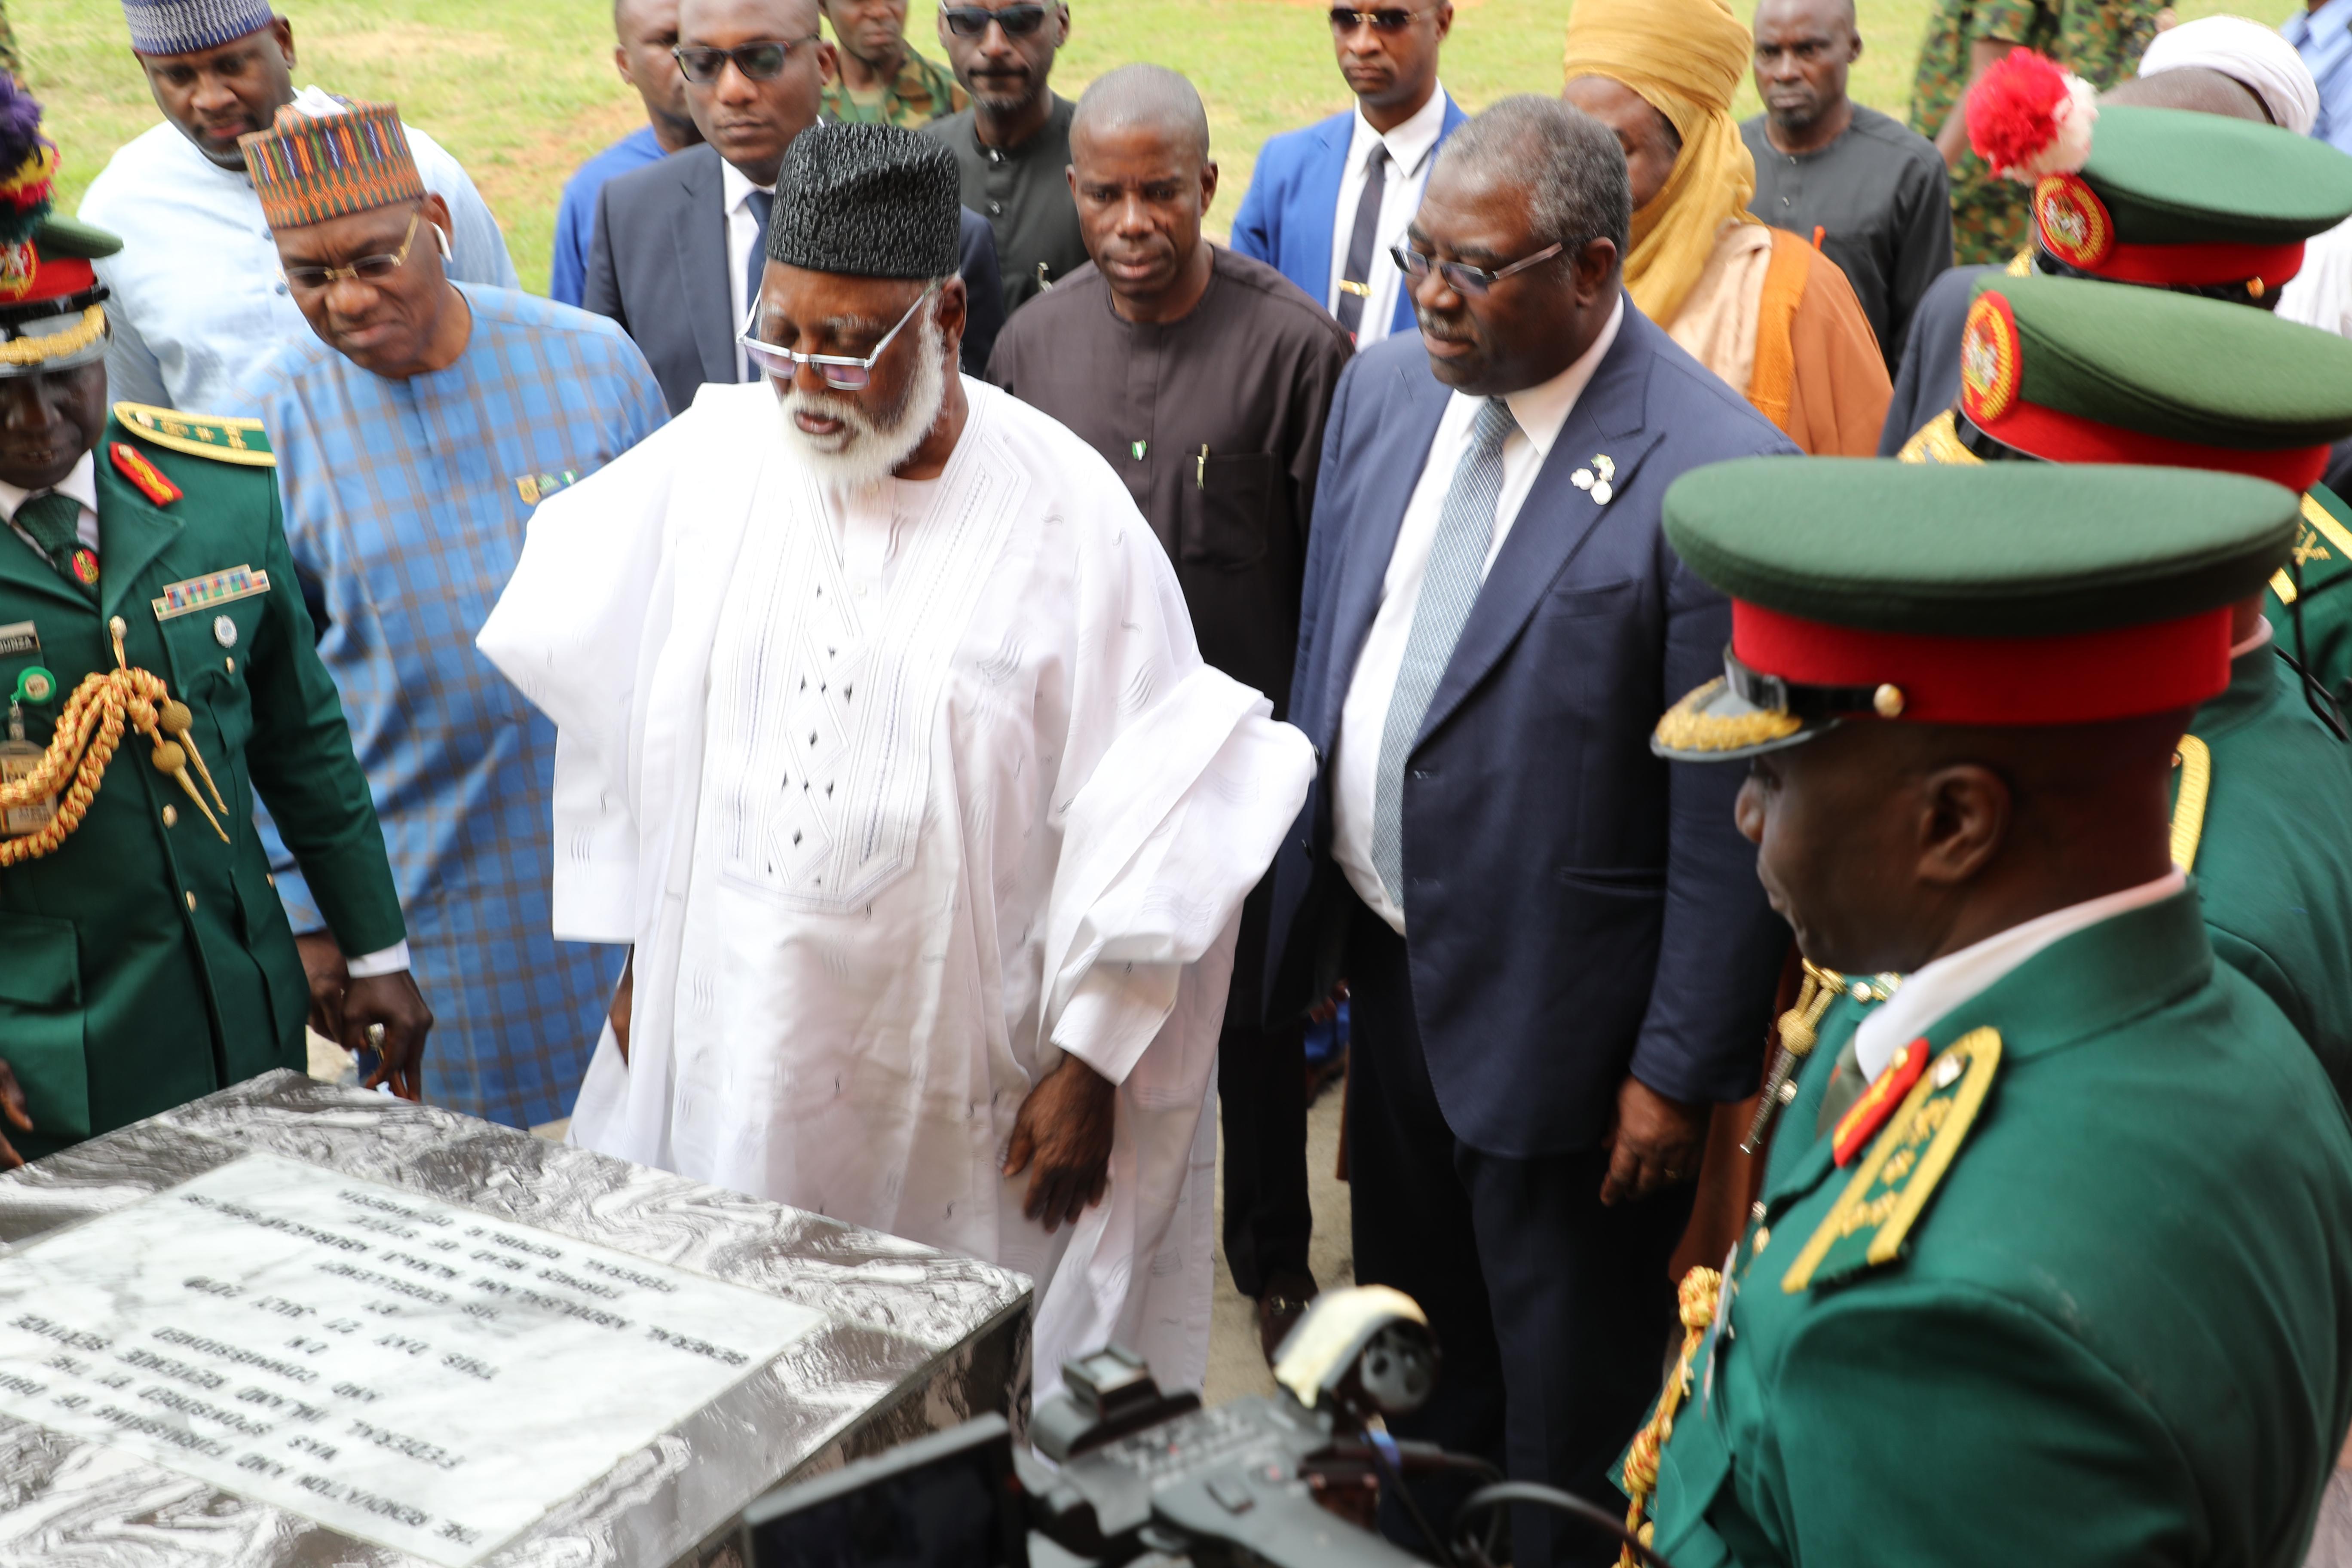 FIRS CSR draws admiration of Nigeria's former president, Abubakar